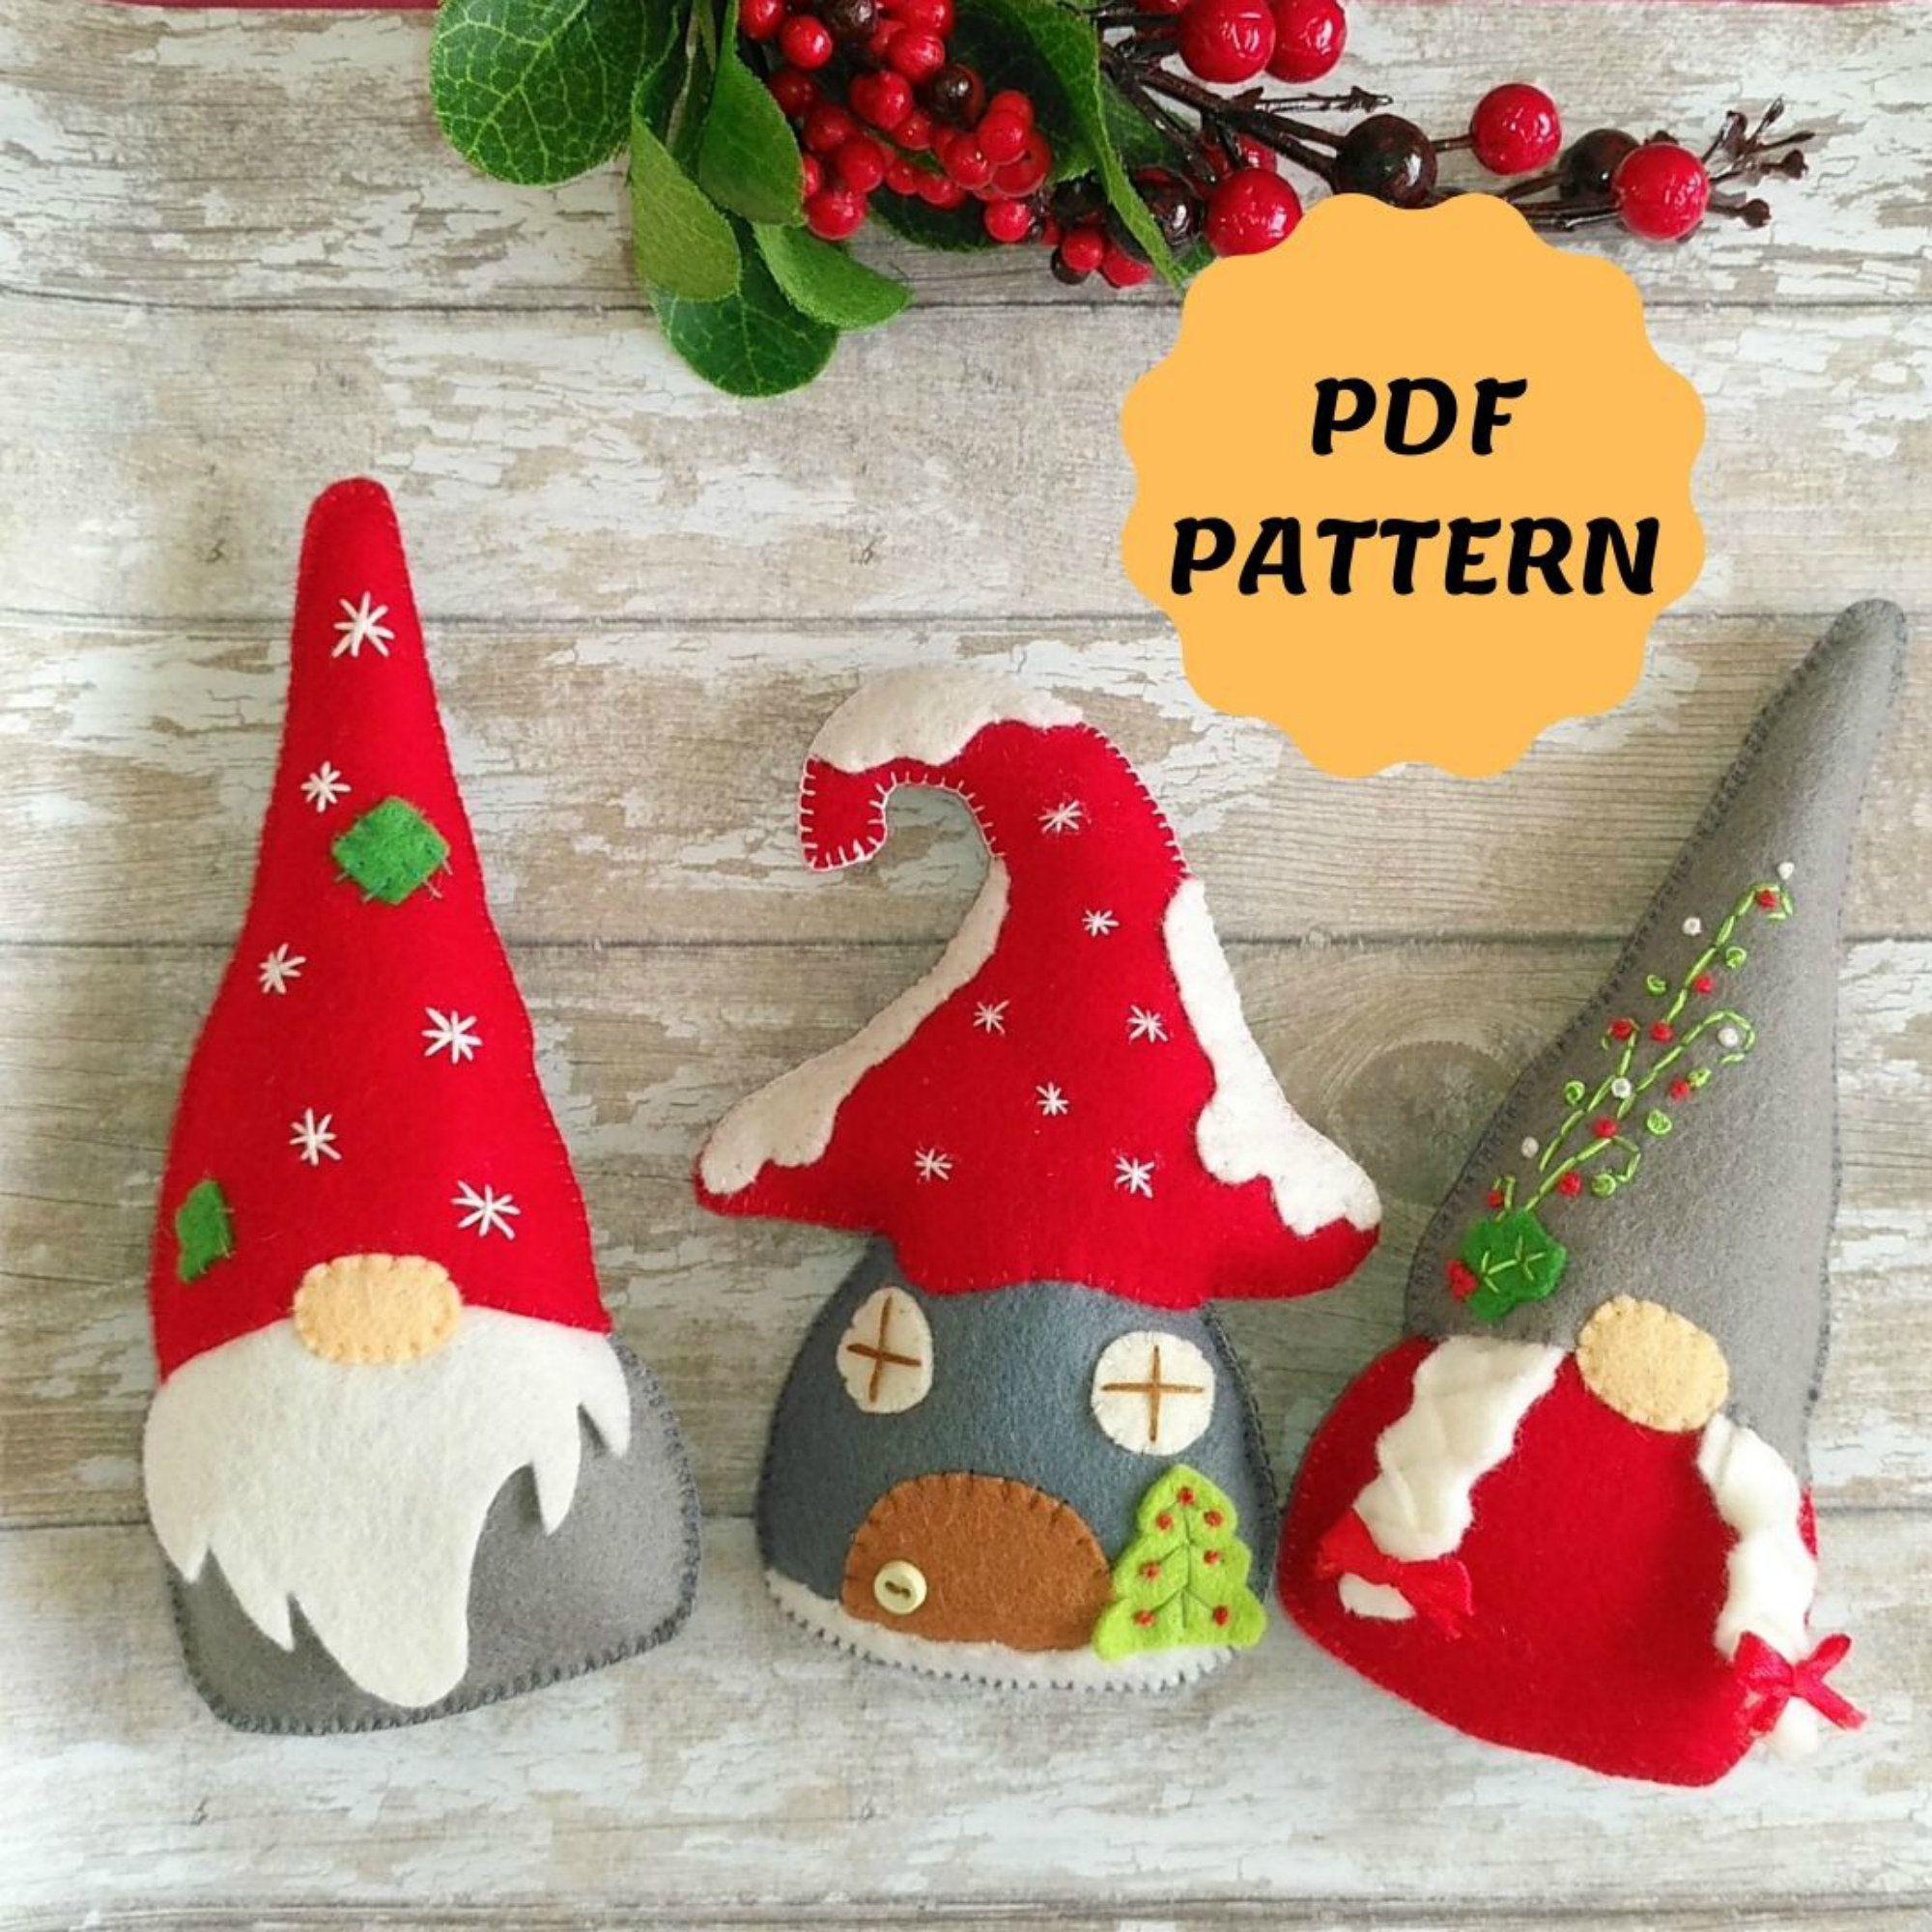 Felt Gnome Ornament Pattern Felt Christmas Ornaments Tomte Swedish Gnome Gnomes Sewing Pattern Christmas Gnomes Pattern Felt Gnome Pdf Decor With Images Felt Christmas Ornaments Sewn Christmas Ornaments Felt Ornaments Patterns